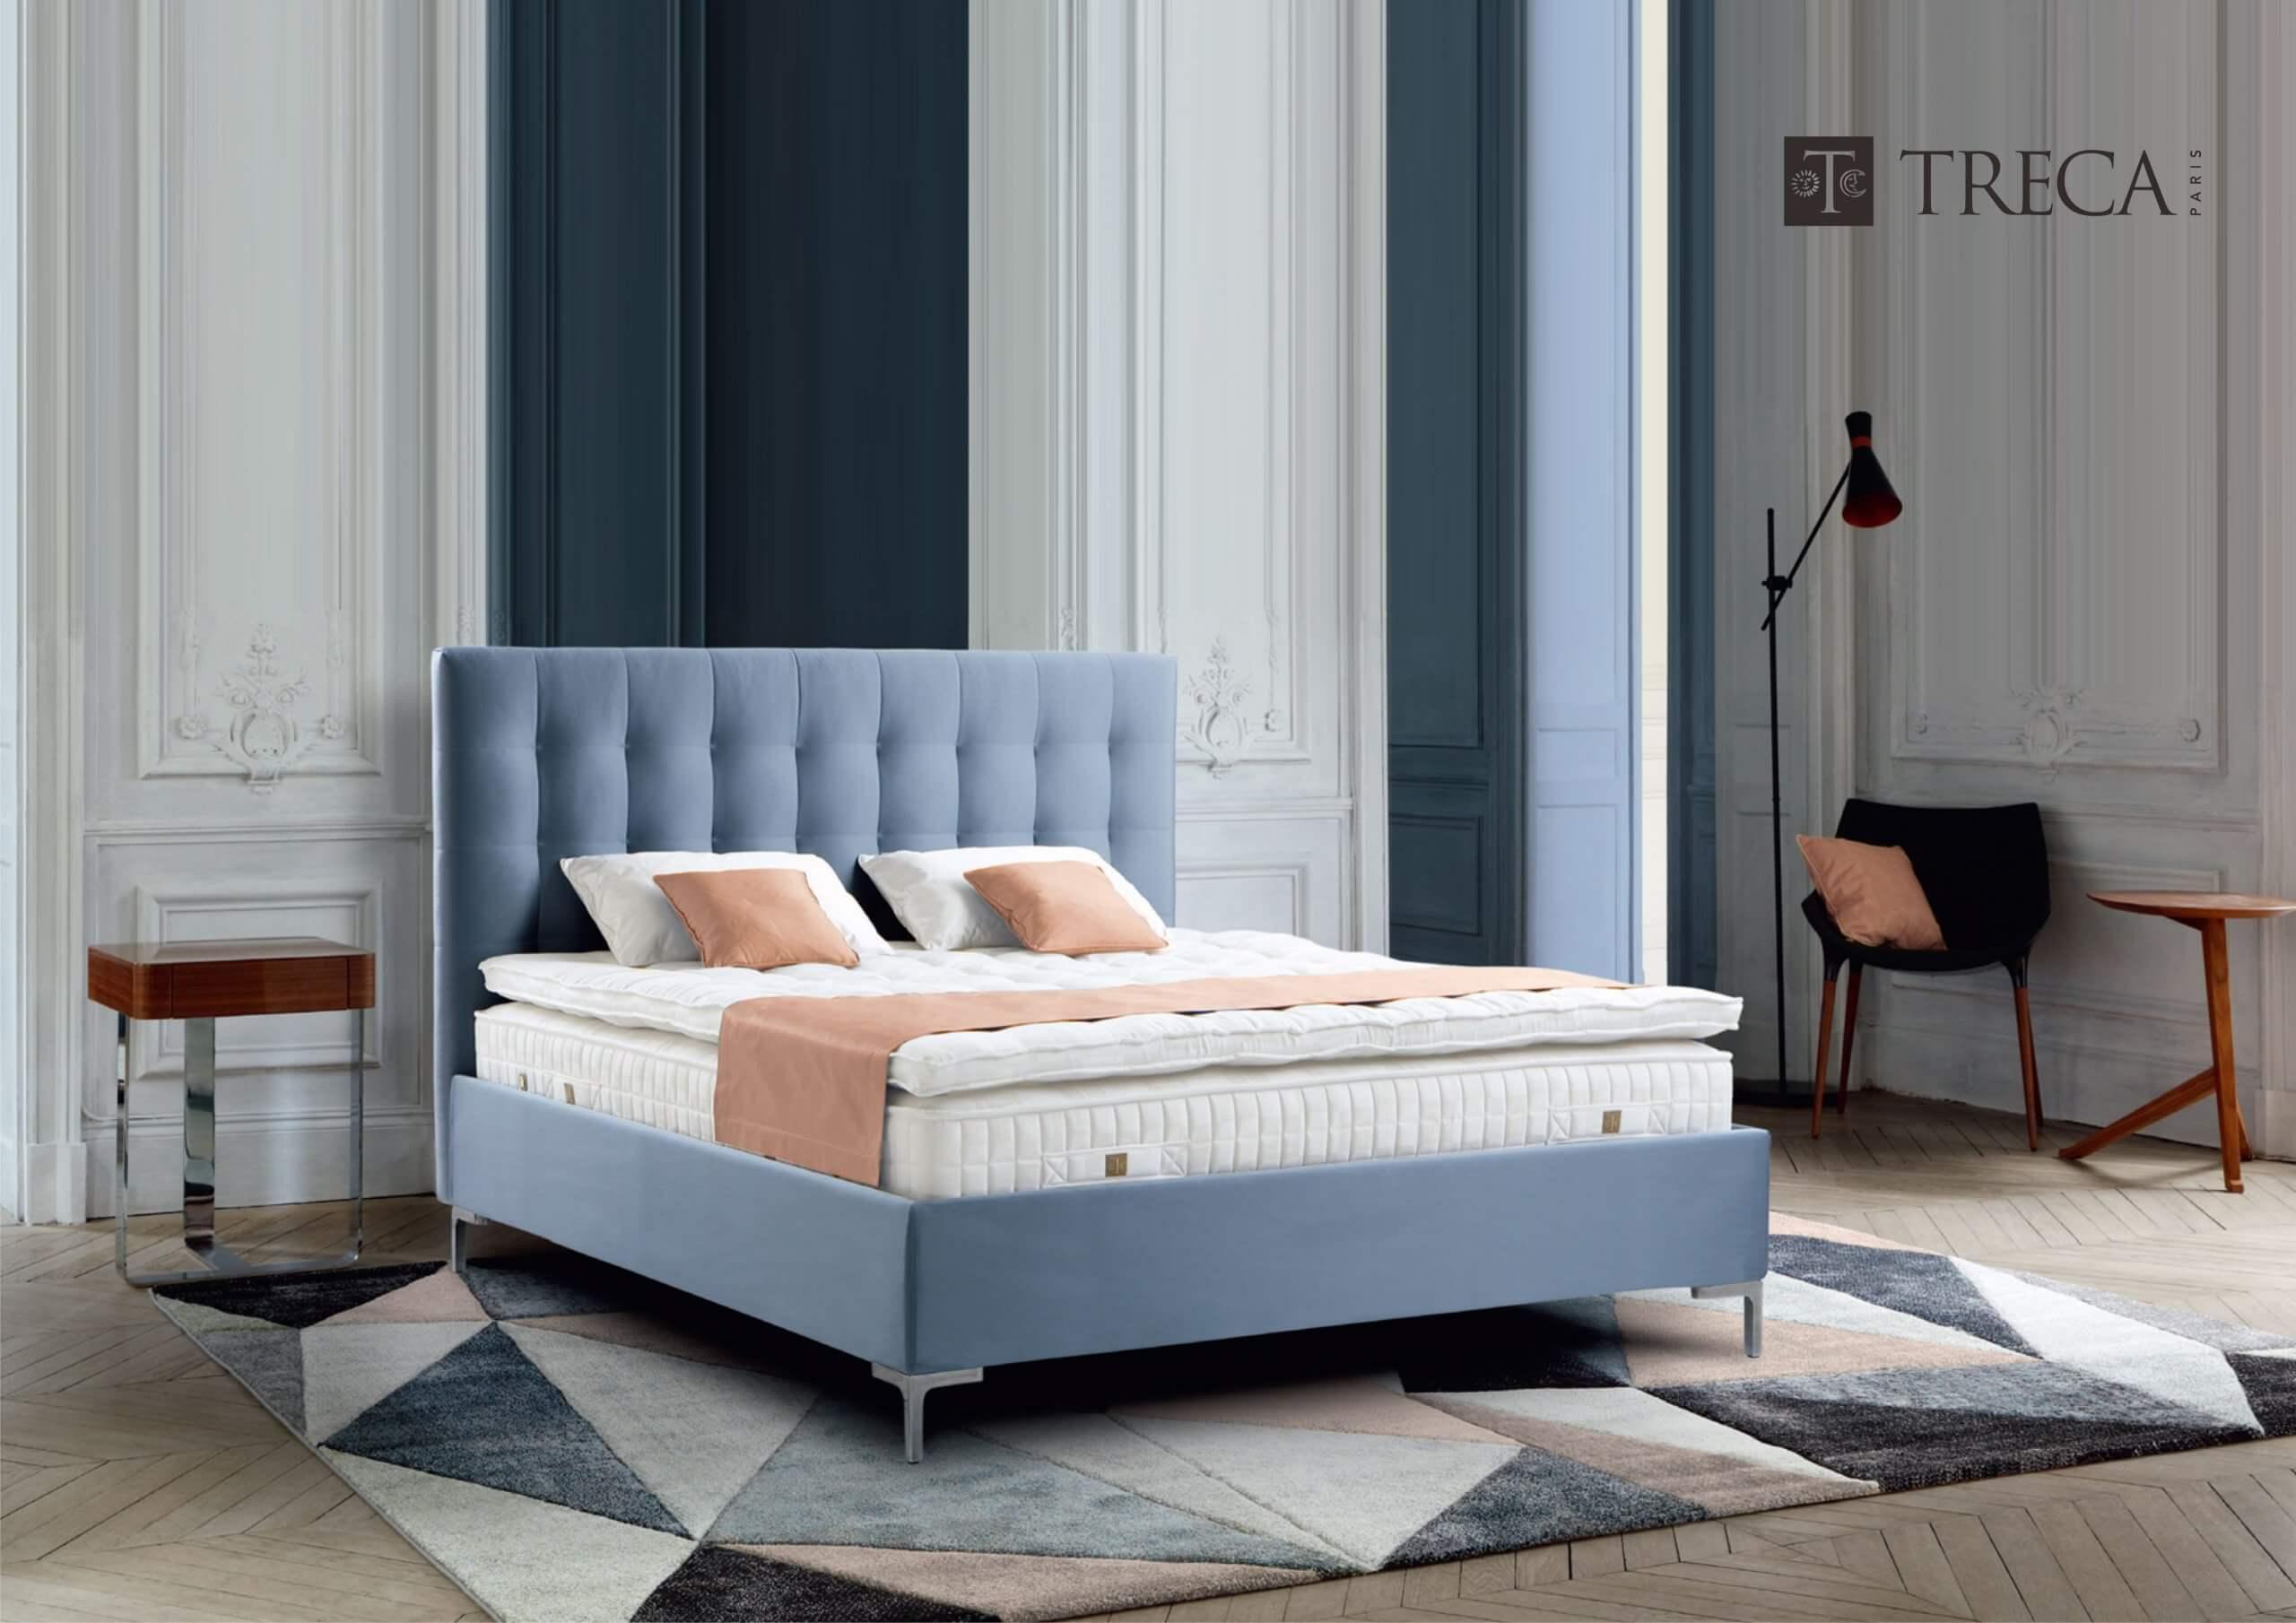 TRECA 法國進口床墊設計